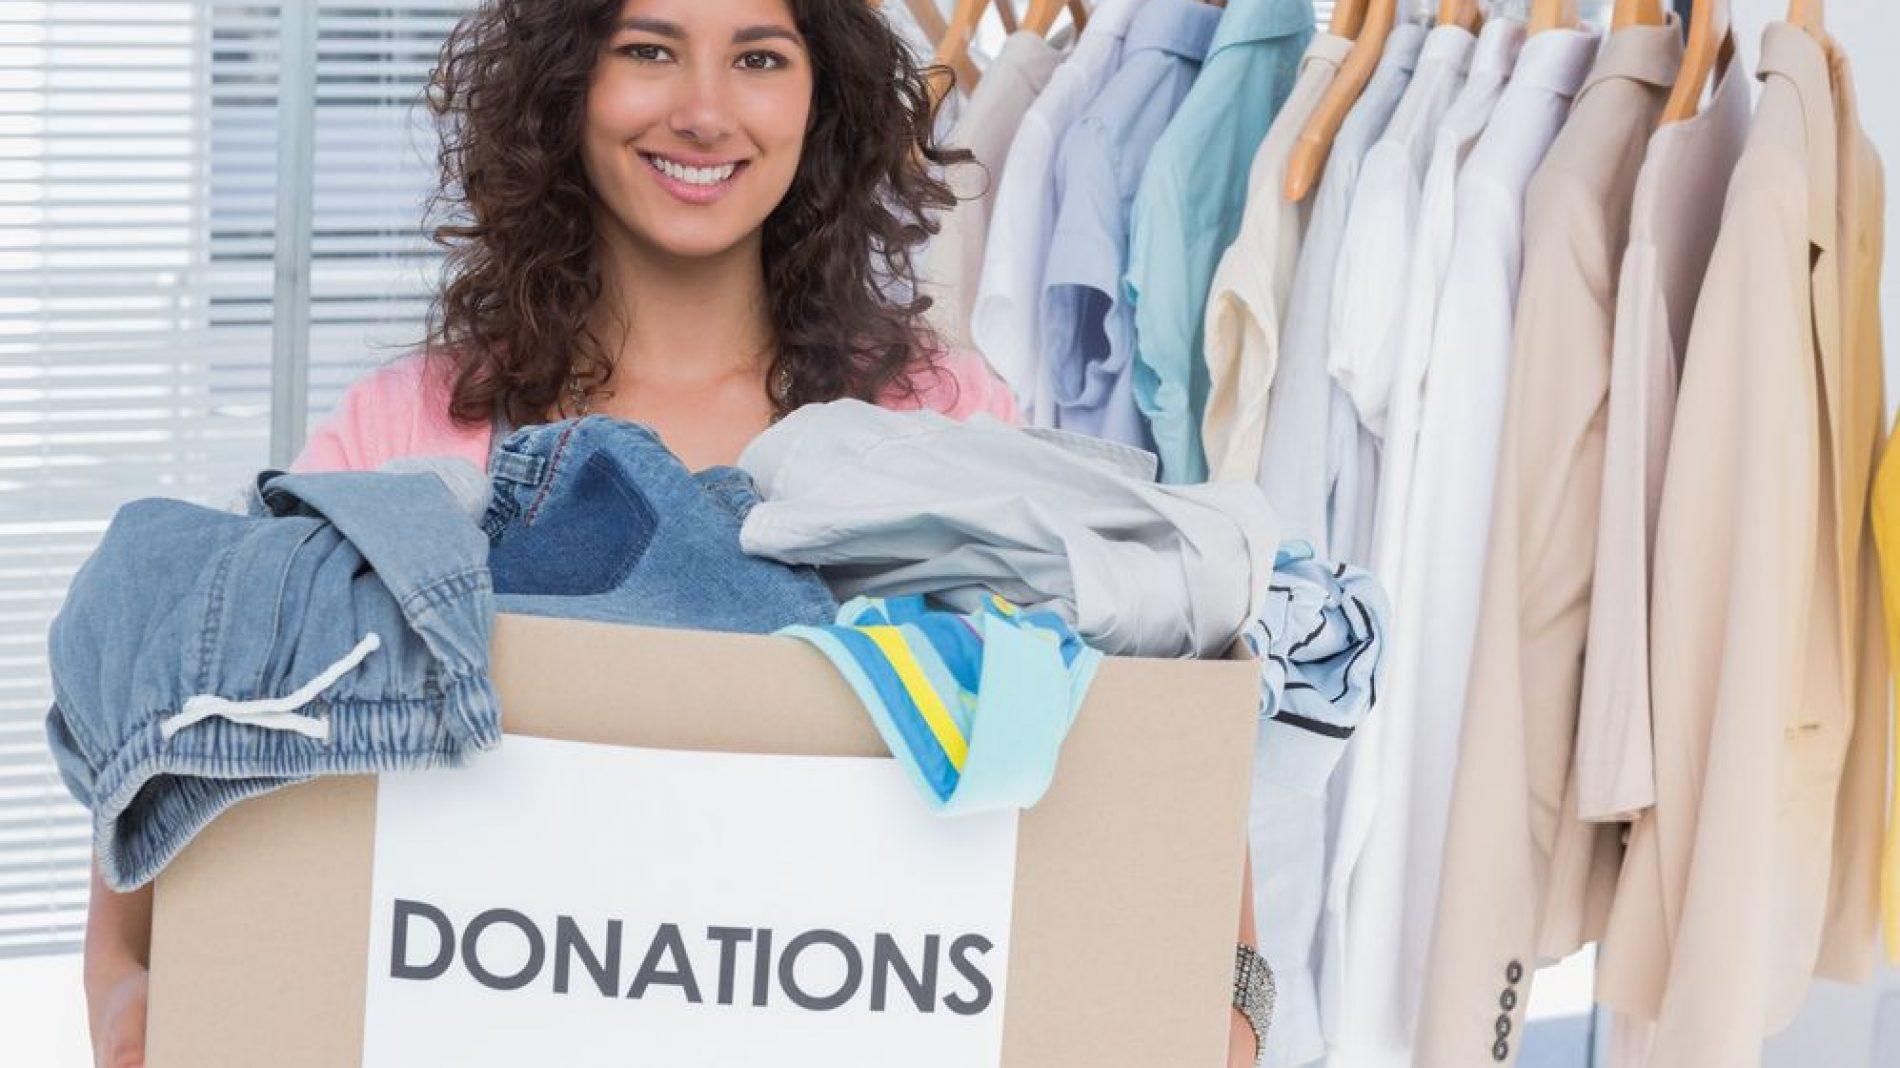 DonationsCharityShop